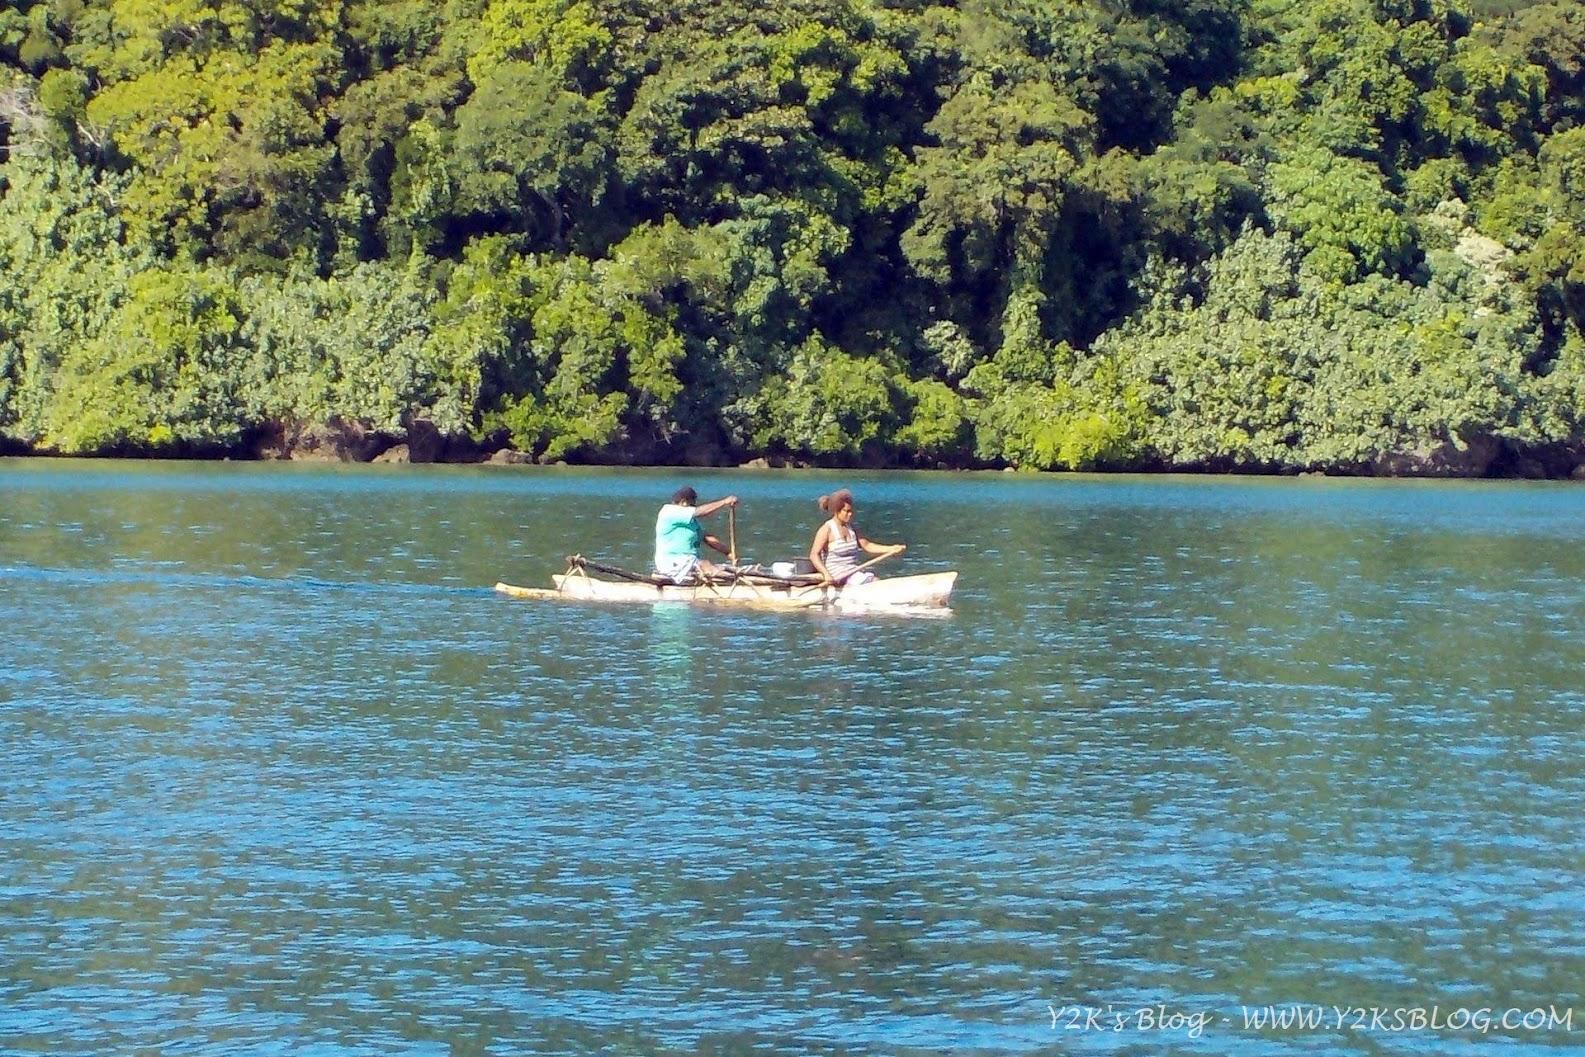 Donne di Lamen Bay - Epi